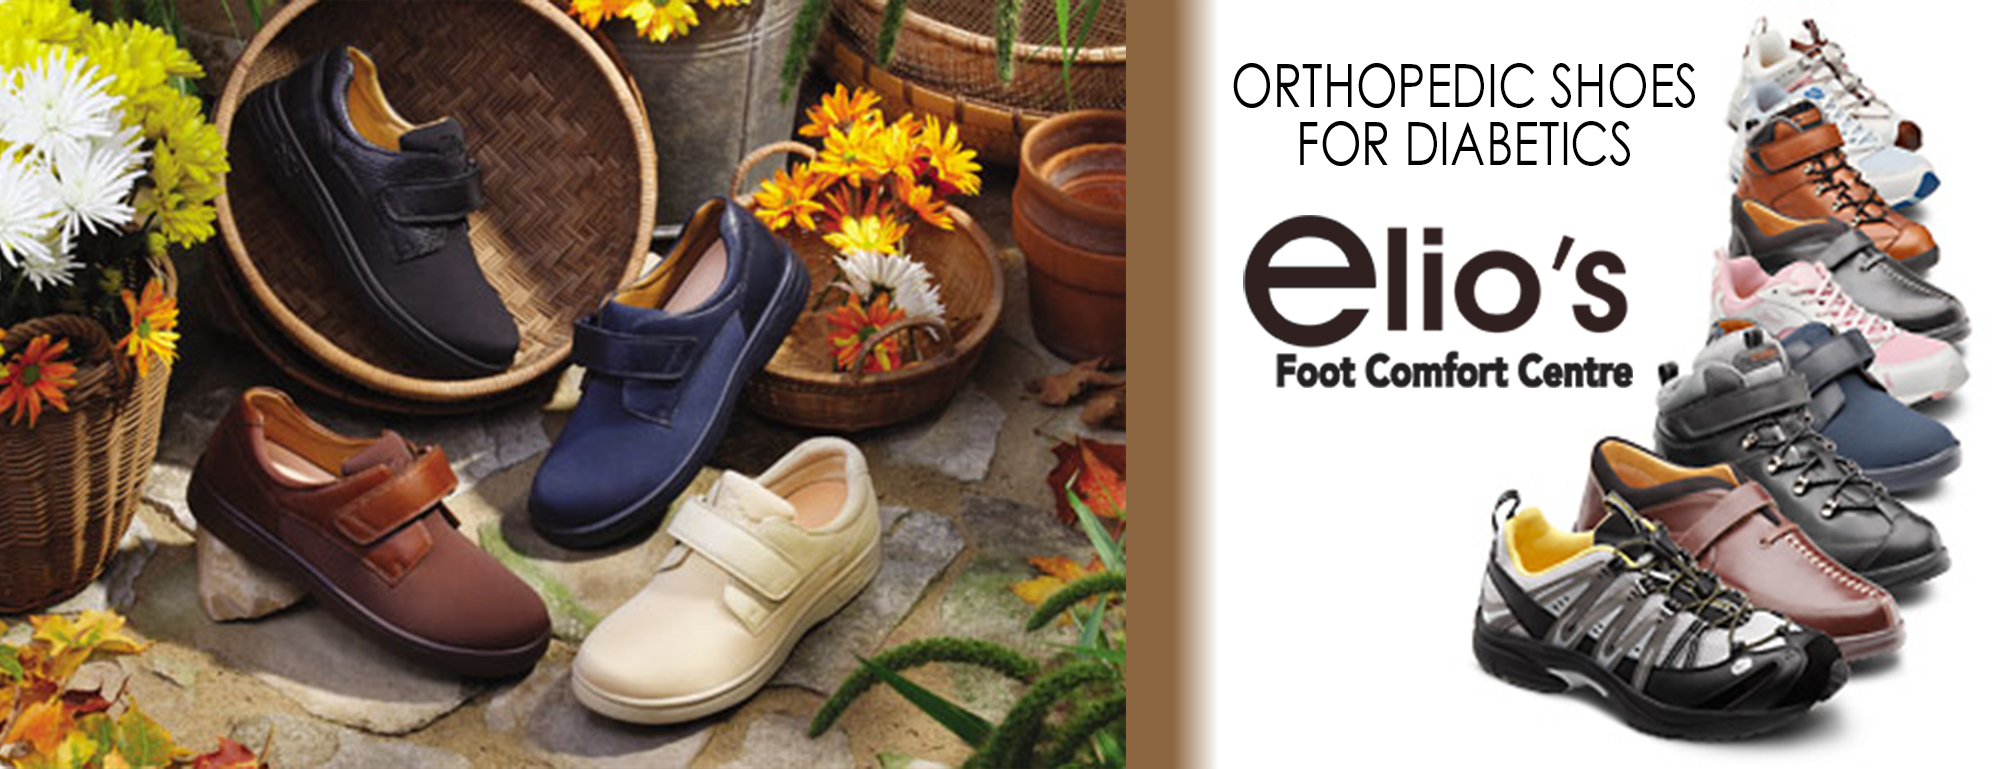 Diabetic Footwear Elio's Foot Comfort